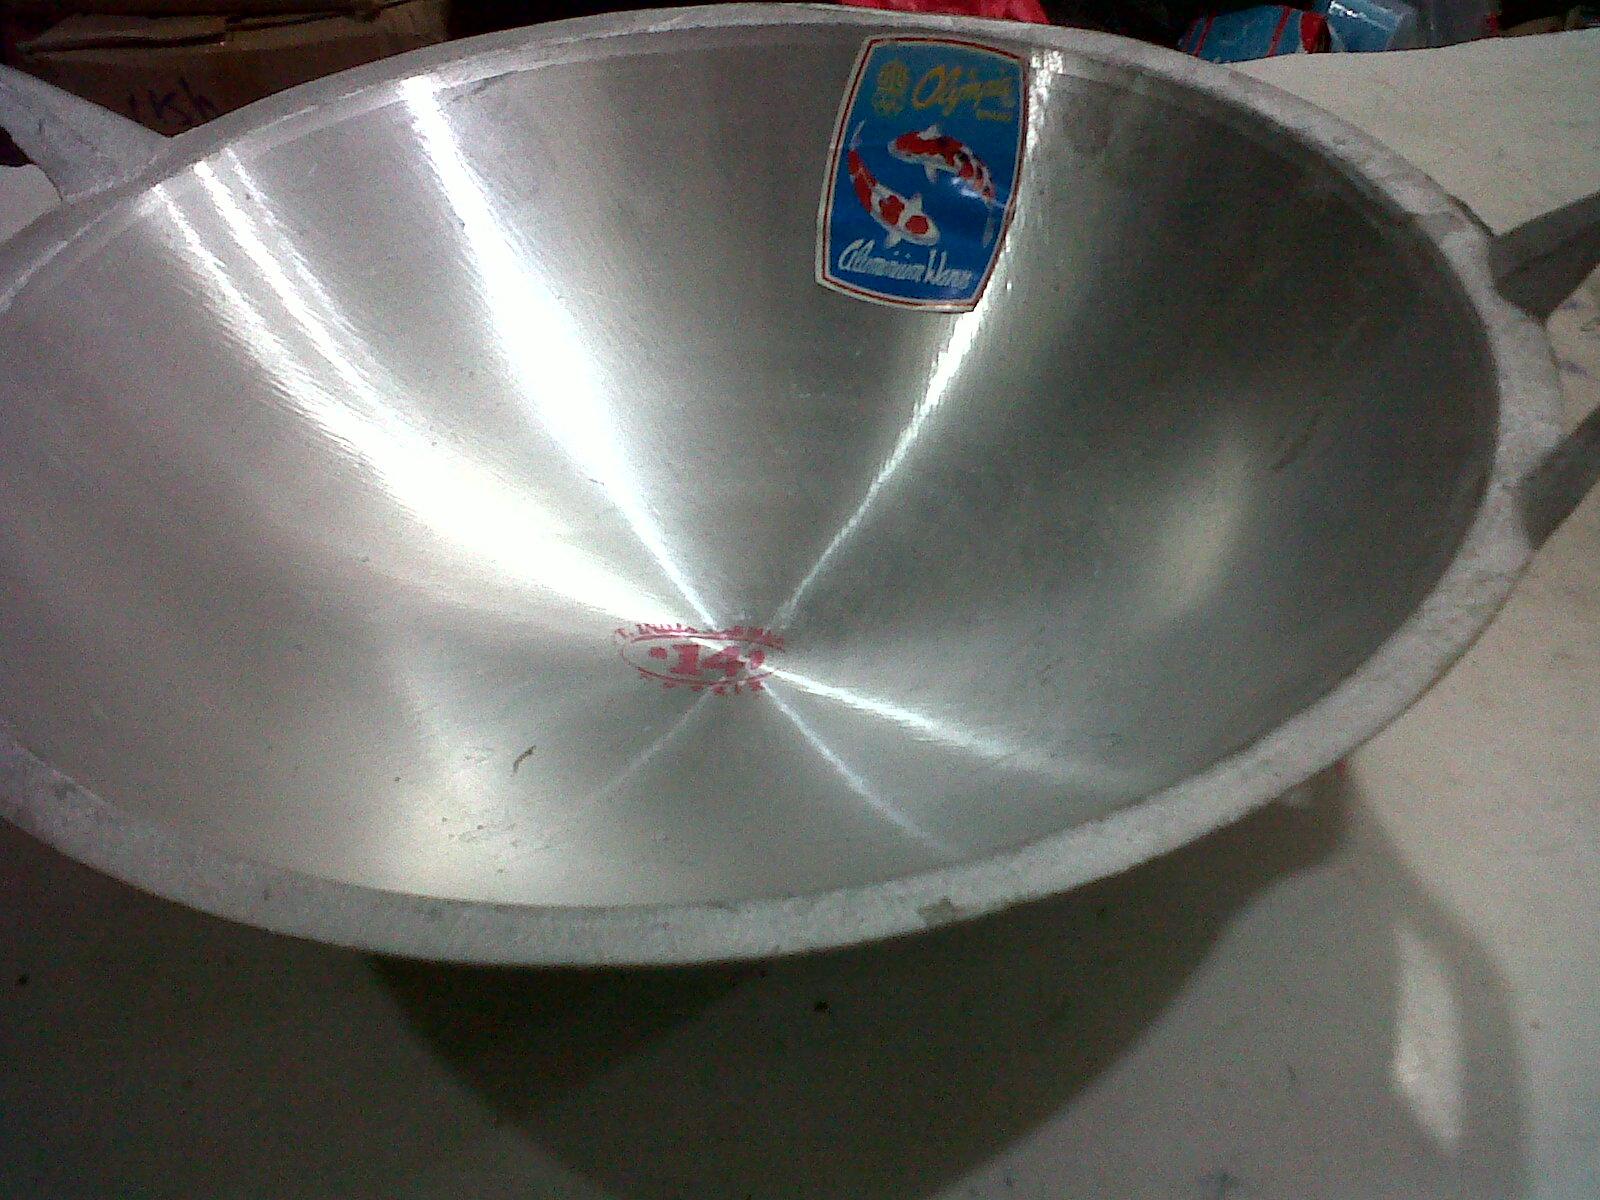 Selatan Jaya distributor barang plastik furnitur Surabaya ...